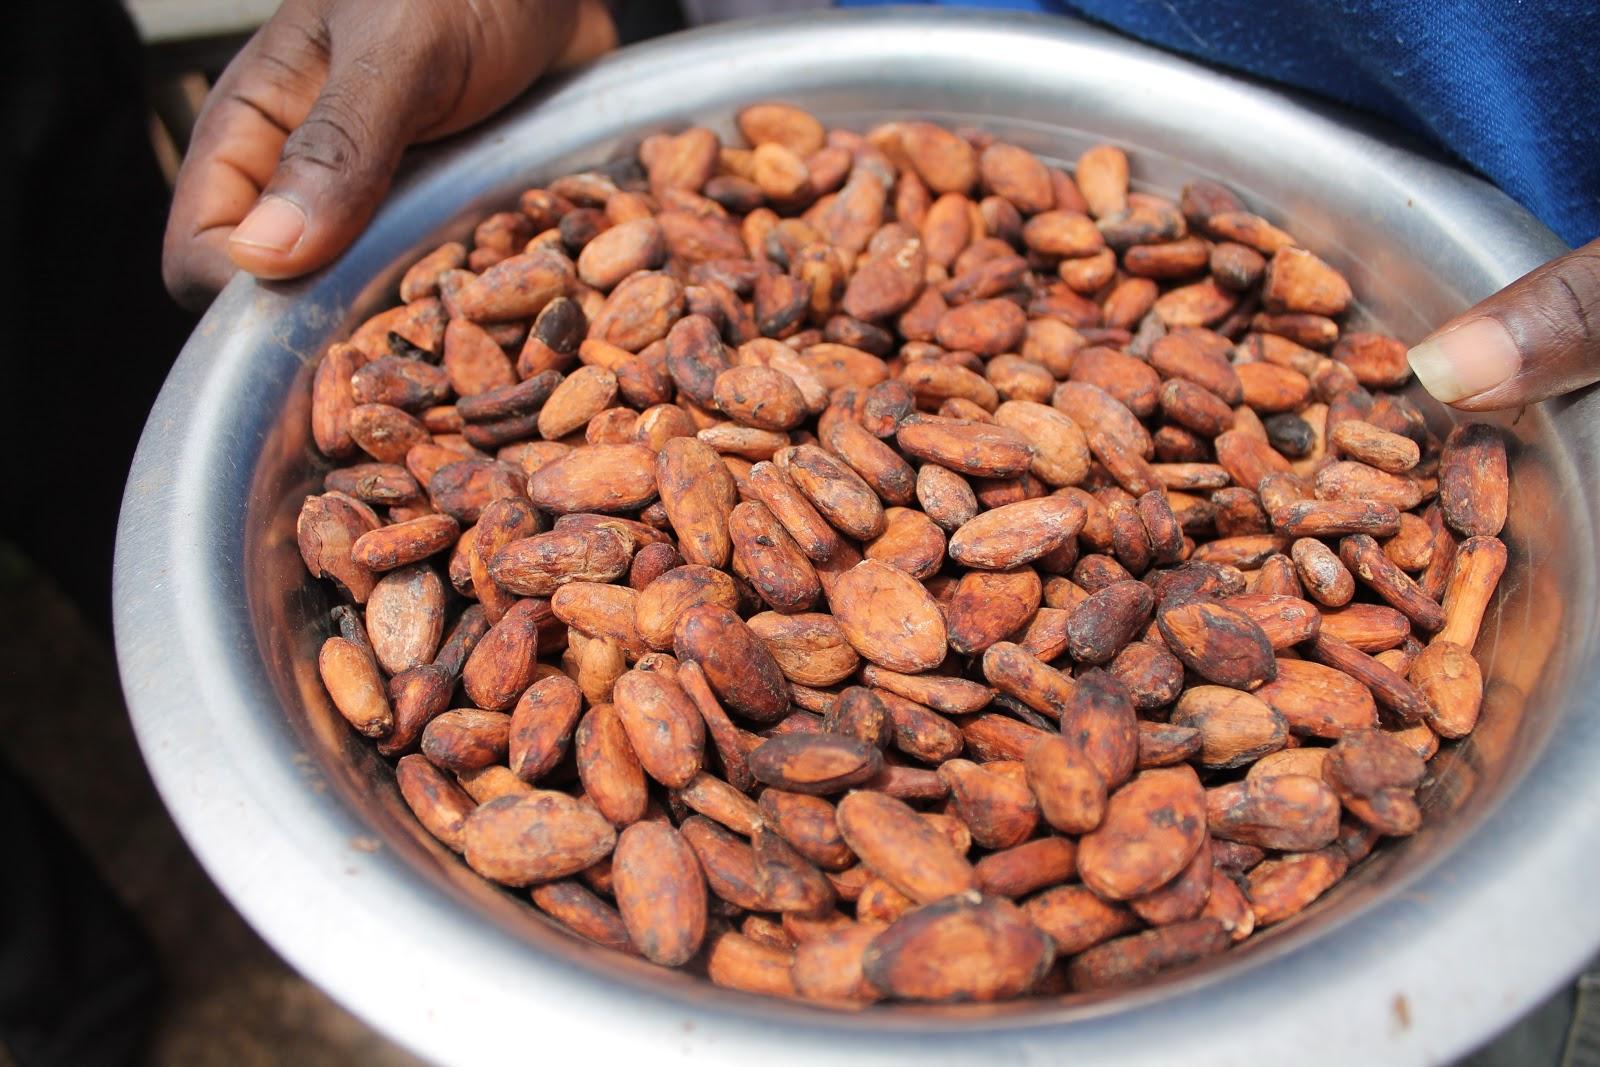 Dipa's Daily Dumplings: Theobroma Cocoa, The Food Of The Gods